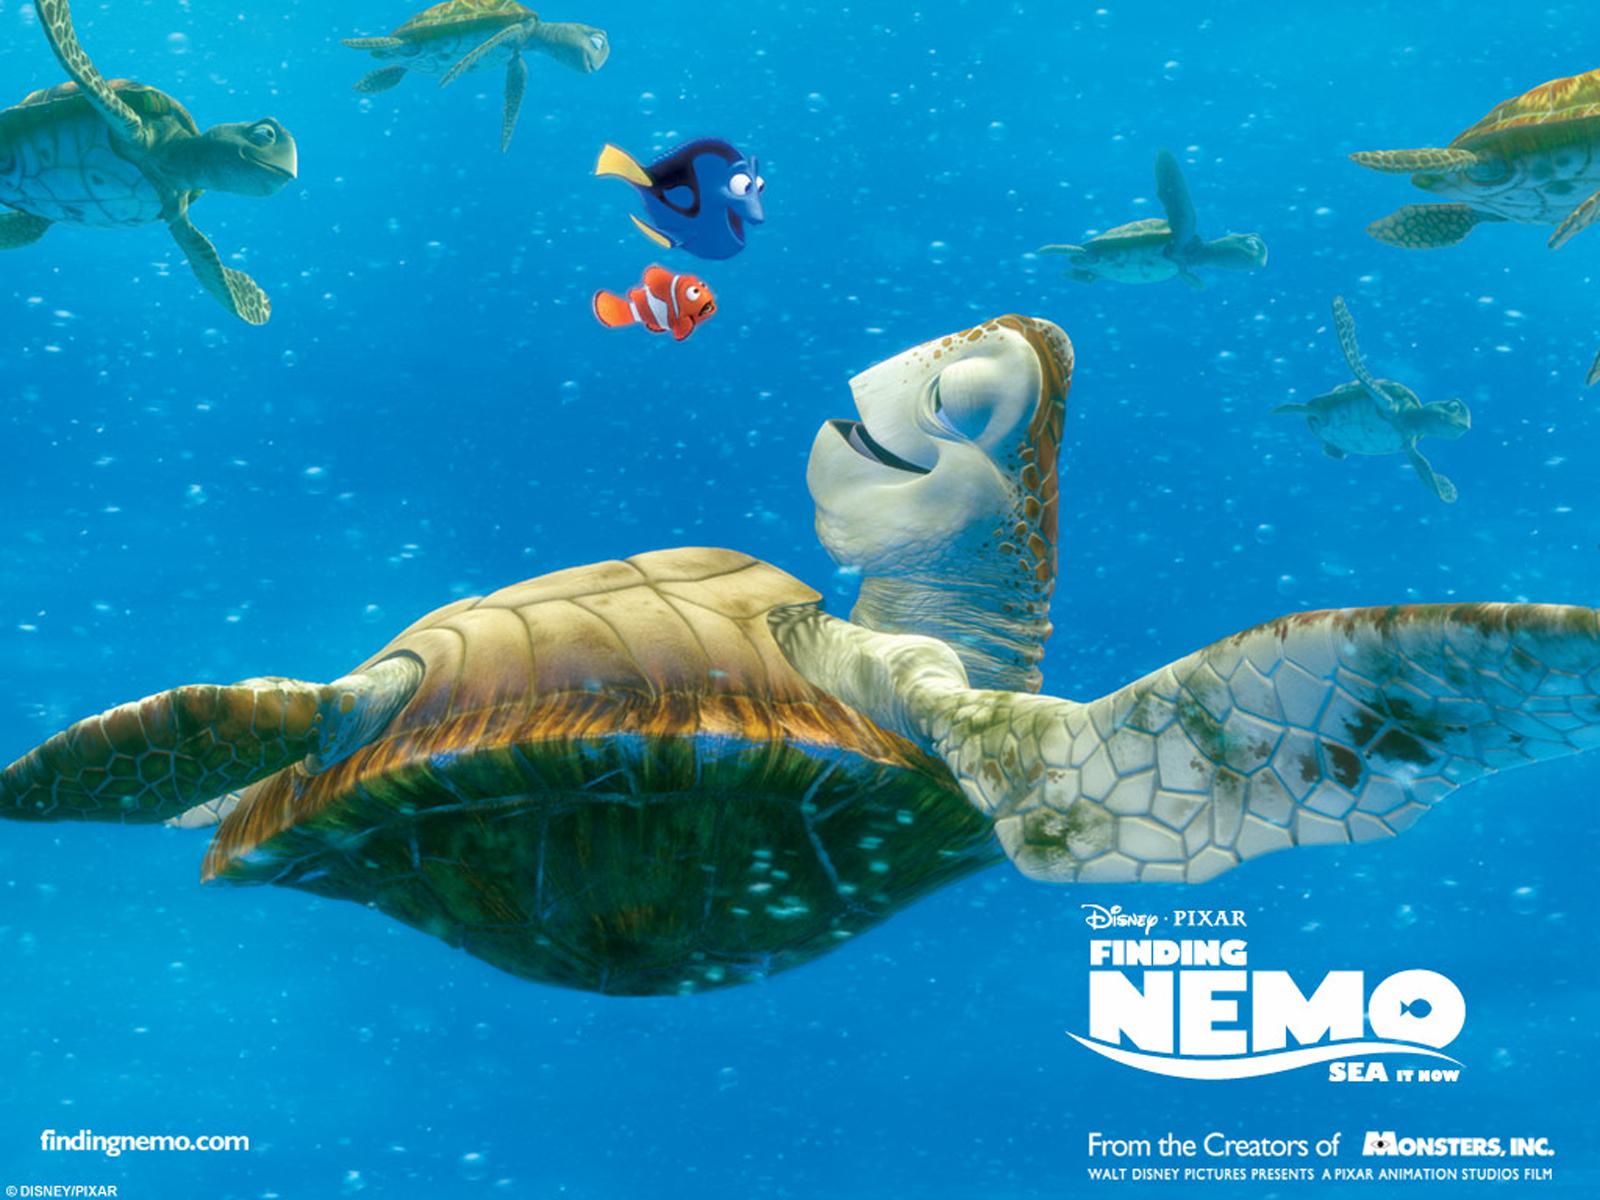 Finding Nemo 3d Movie Poster Hd Wallpapers Cartoon